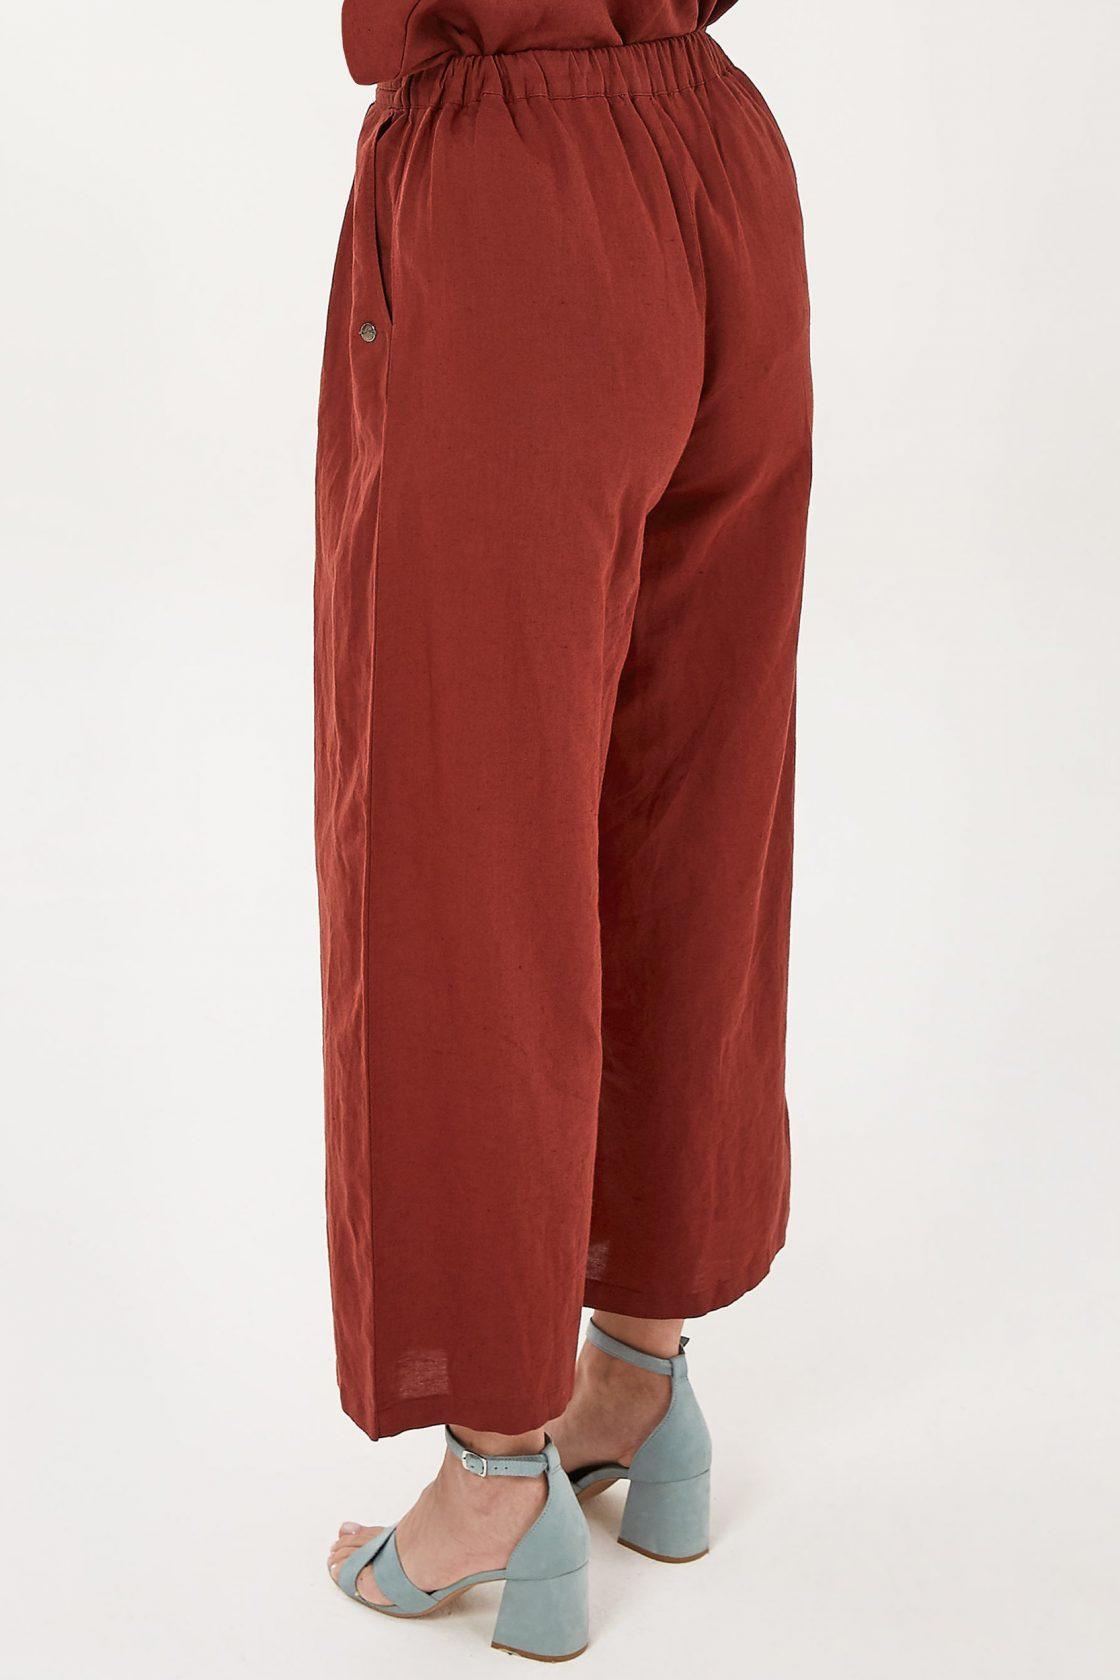 Roberta Organic Fashion Organication Hose Mit Leinen Hot Chocolate 1